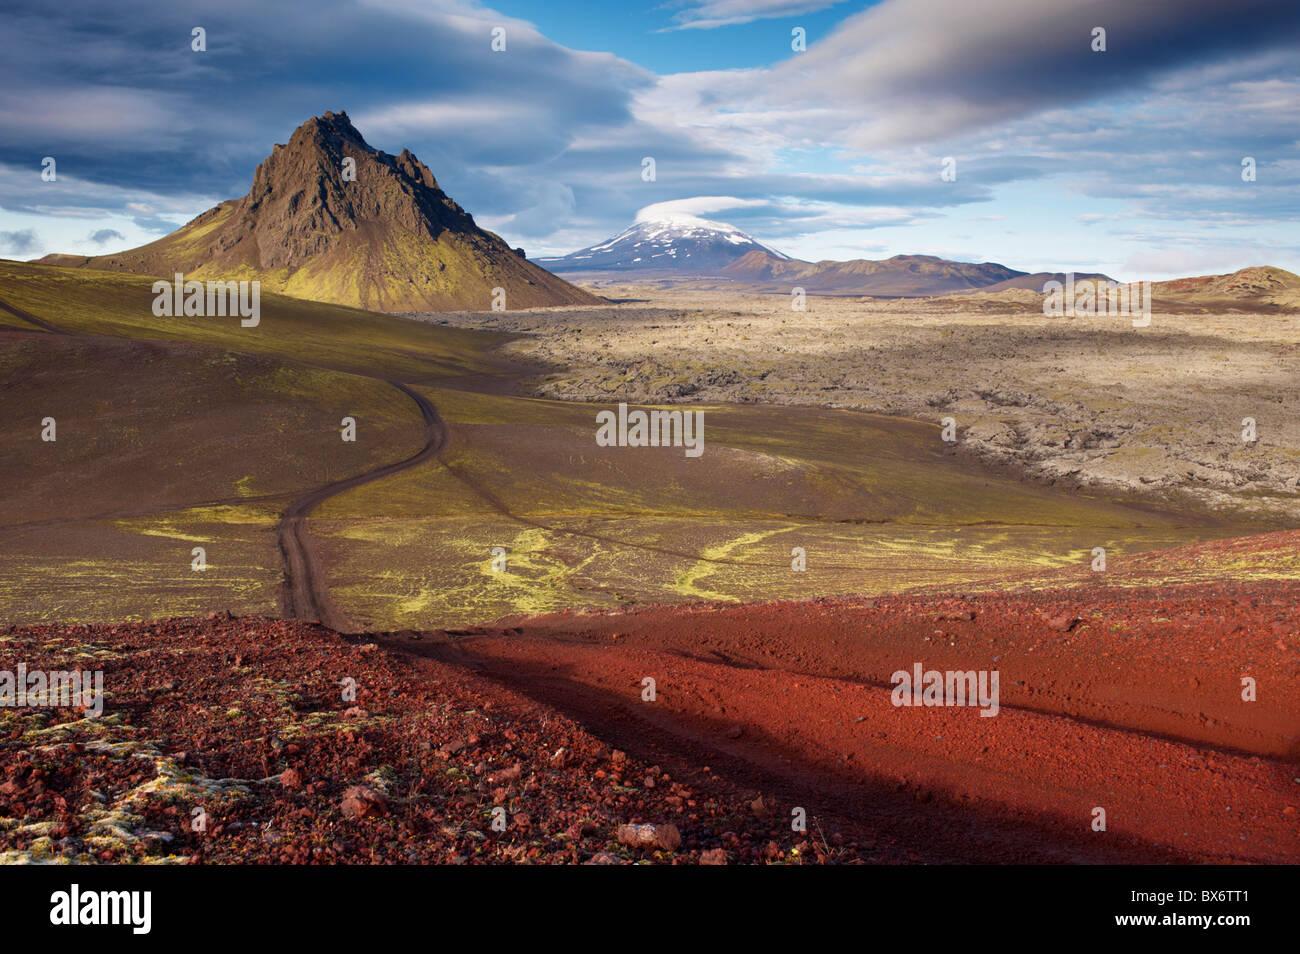 Mount Krakatindur, 858 m, standing solitary in the Nyjahraun lava field, Fjallabak, Iceland - Stock Image